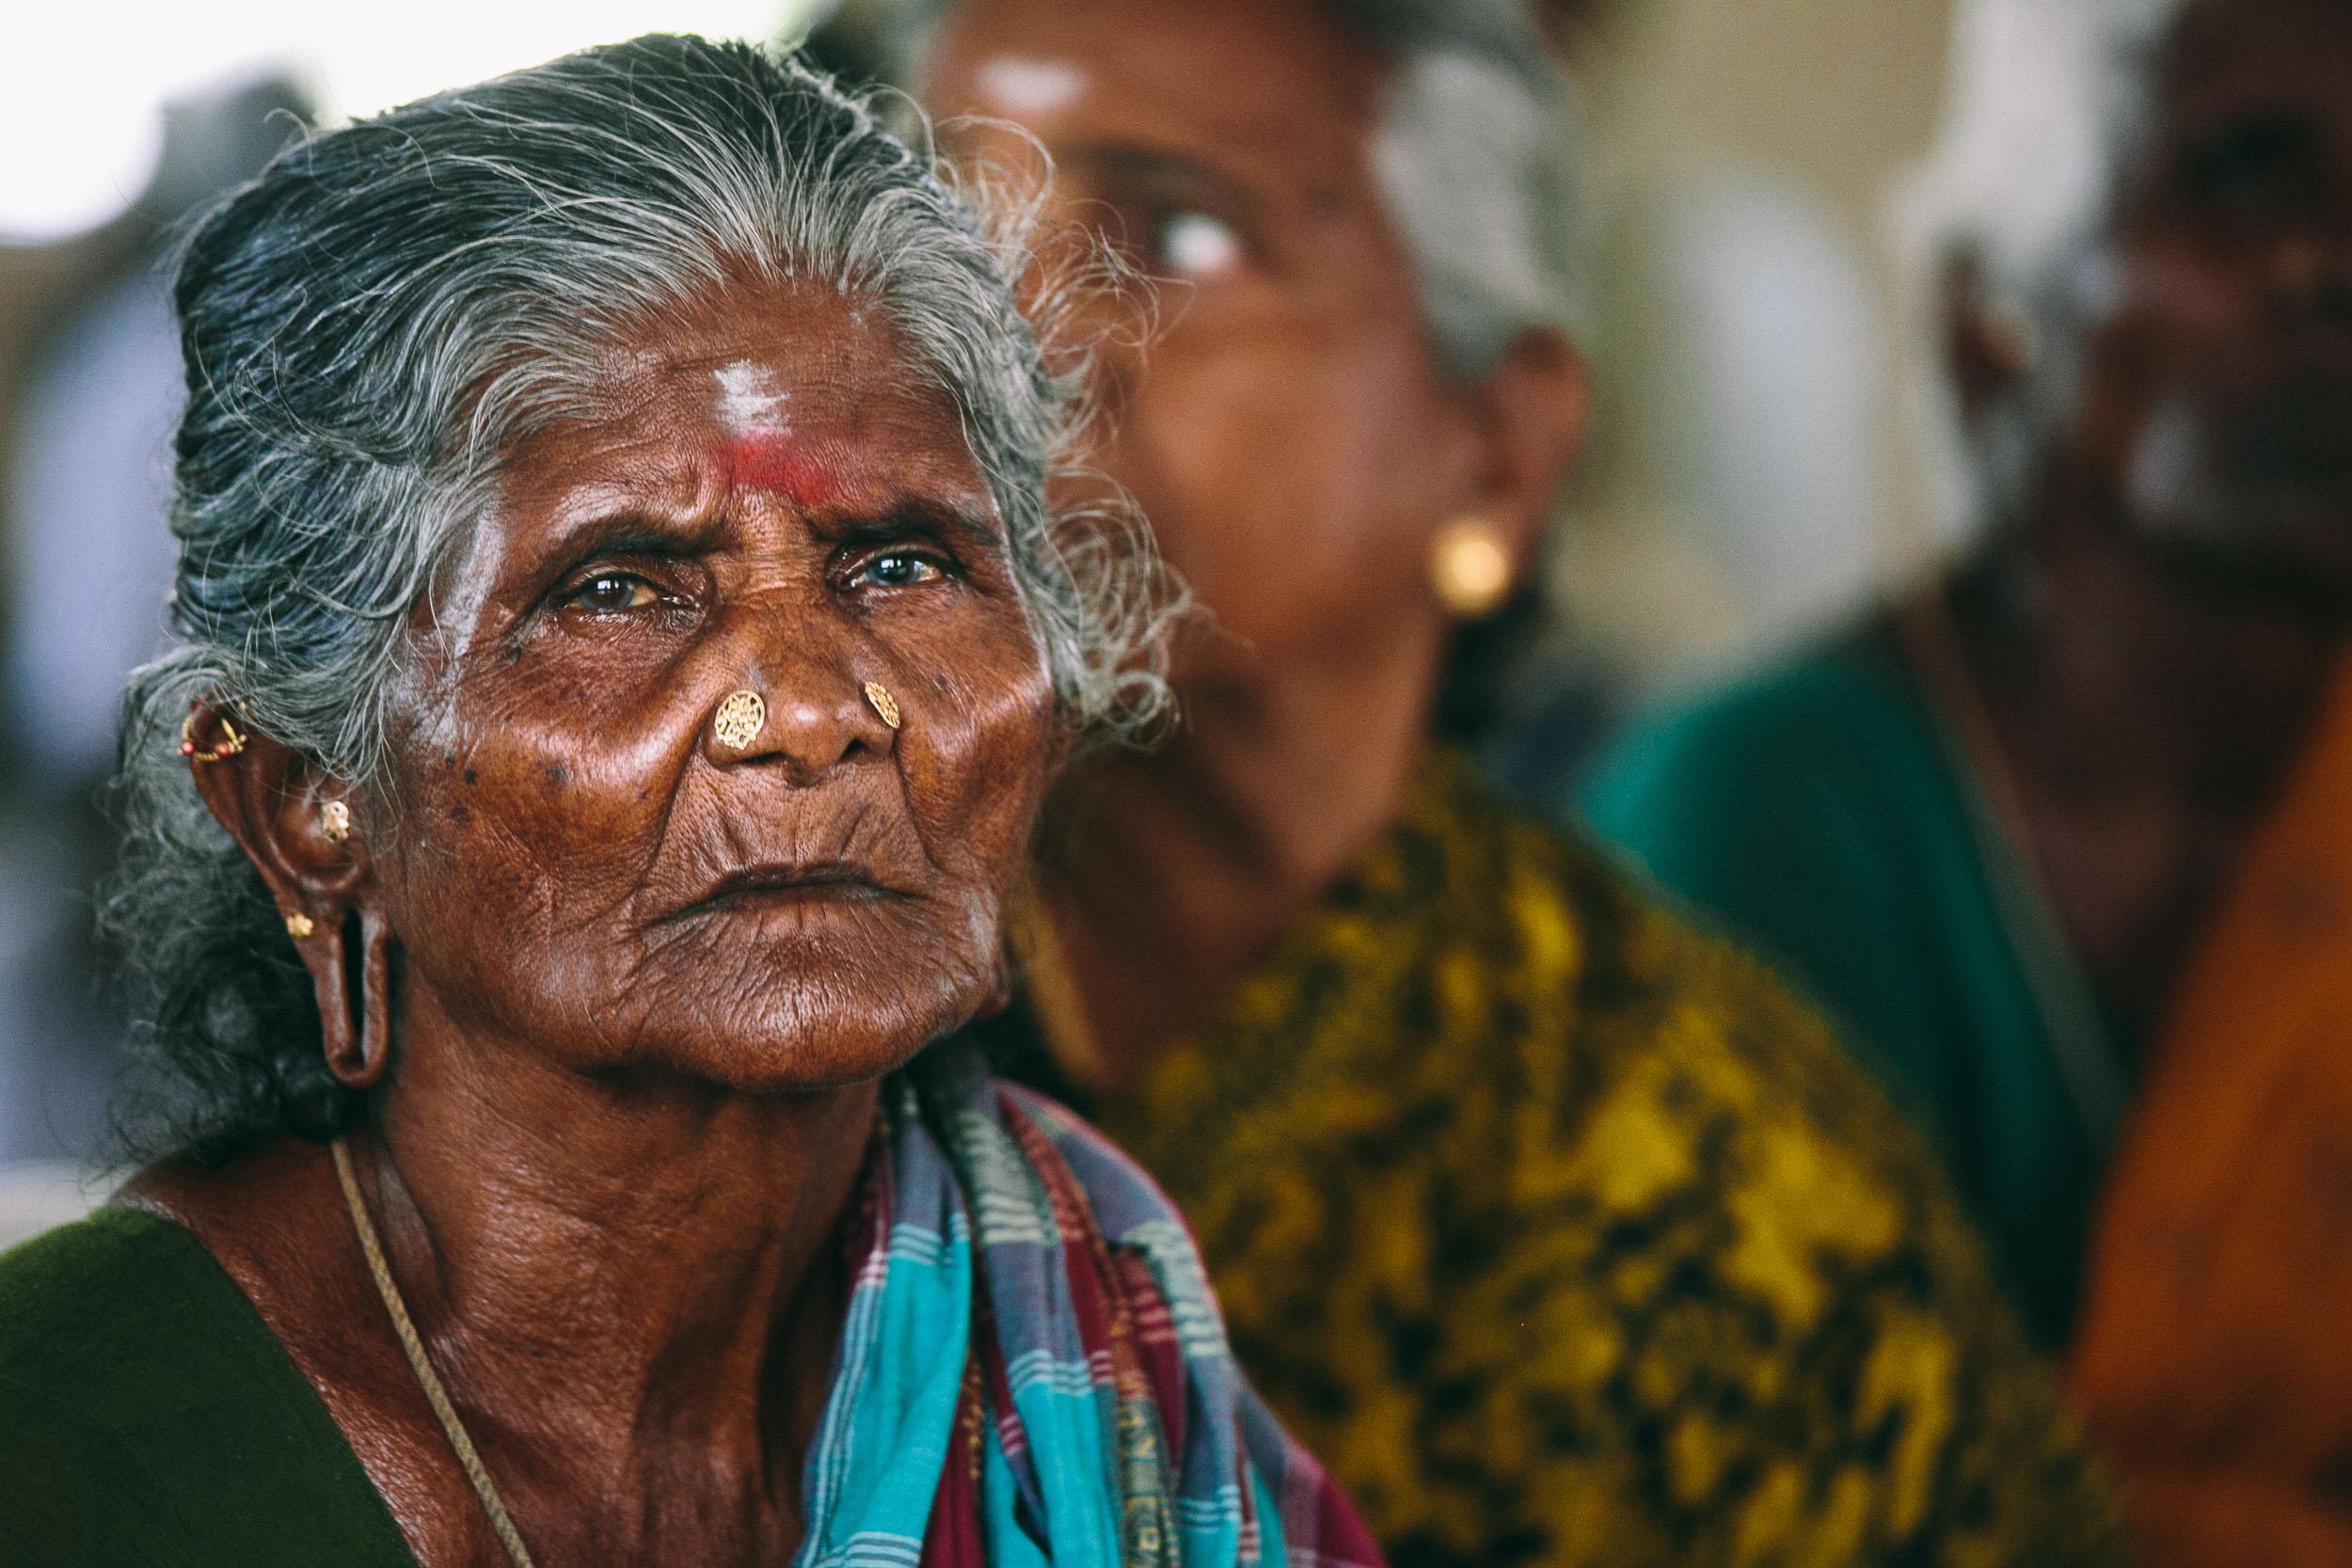 brian-callaway-india-photography-aravind-eye-hospital-31.jpg